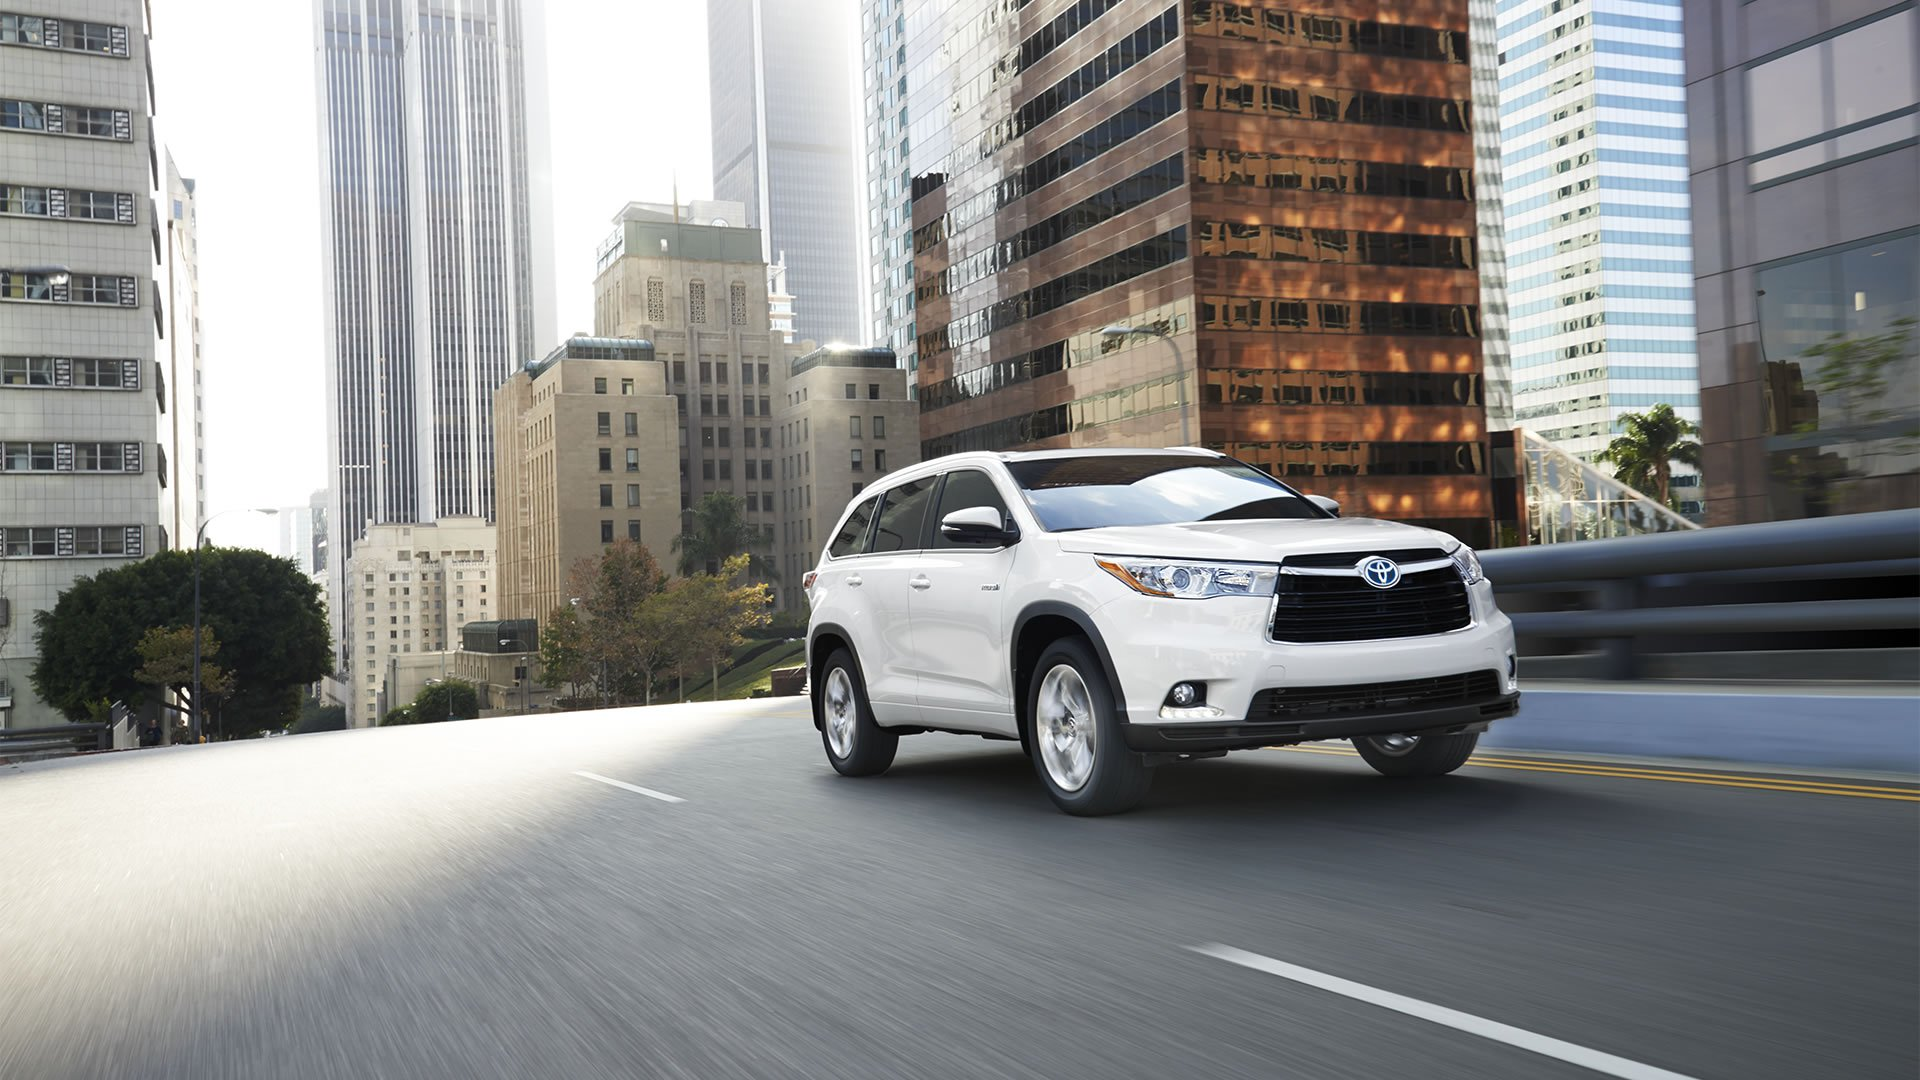 Toyota Dealership Serving Des Moines IA Sales Lease Service - Toyota dealership hours